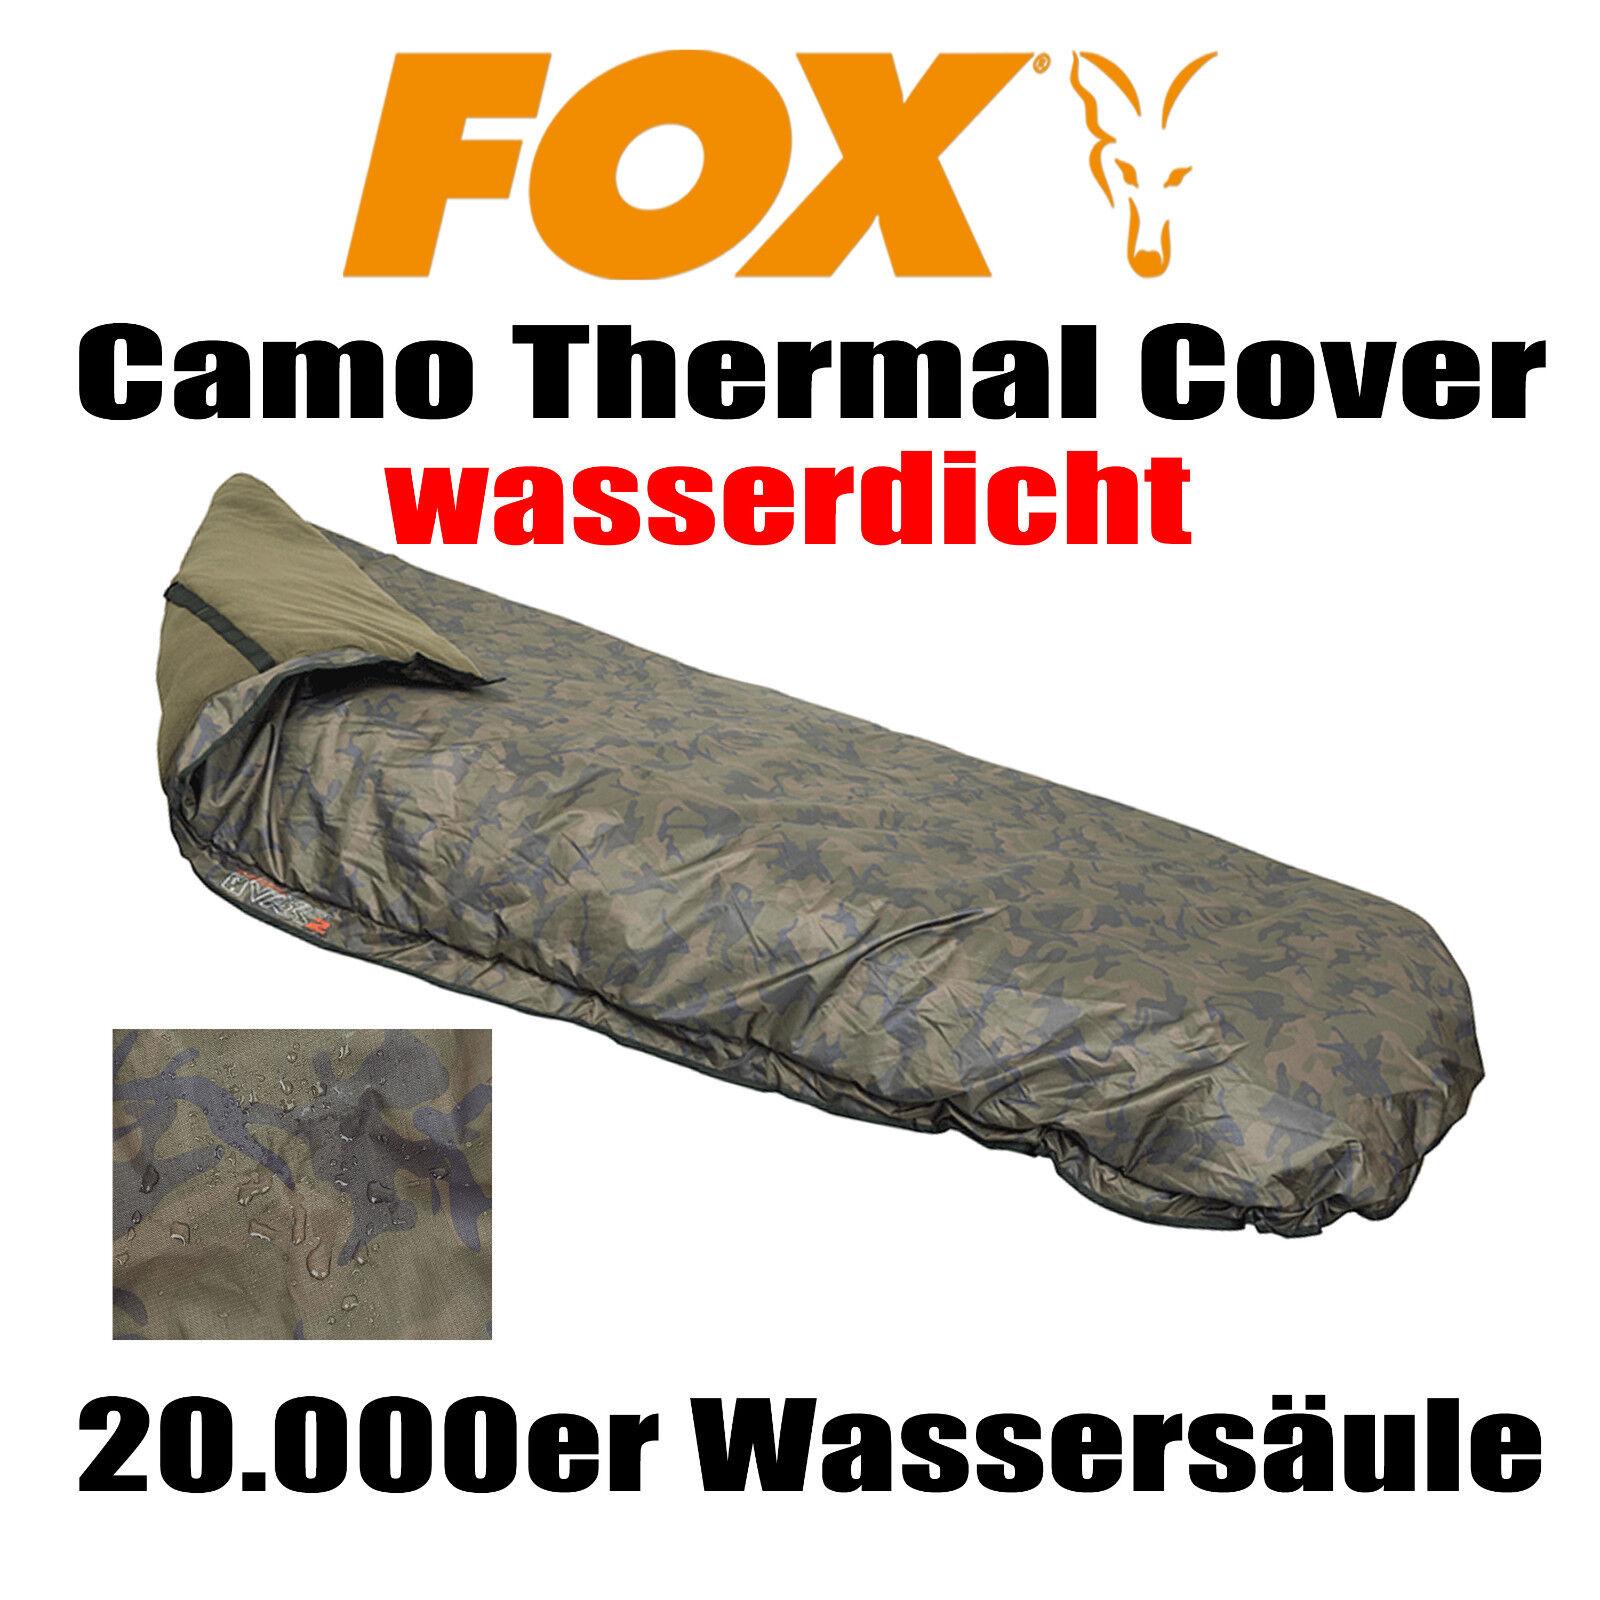 Fox Camo Thermal Cover - VRS1 VRS2 VRS3 Thermo Fleece Decke Karpfen Angeln